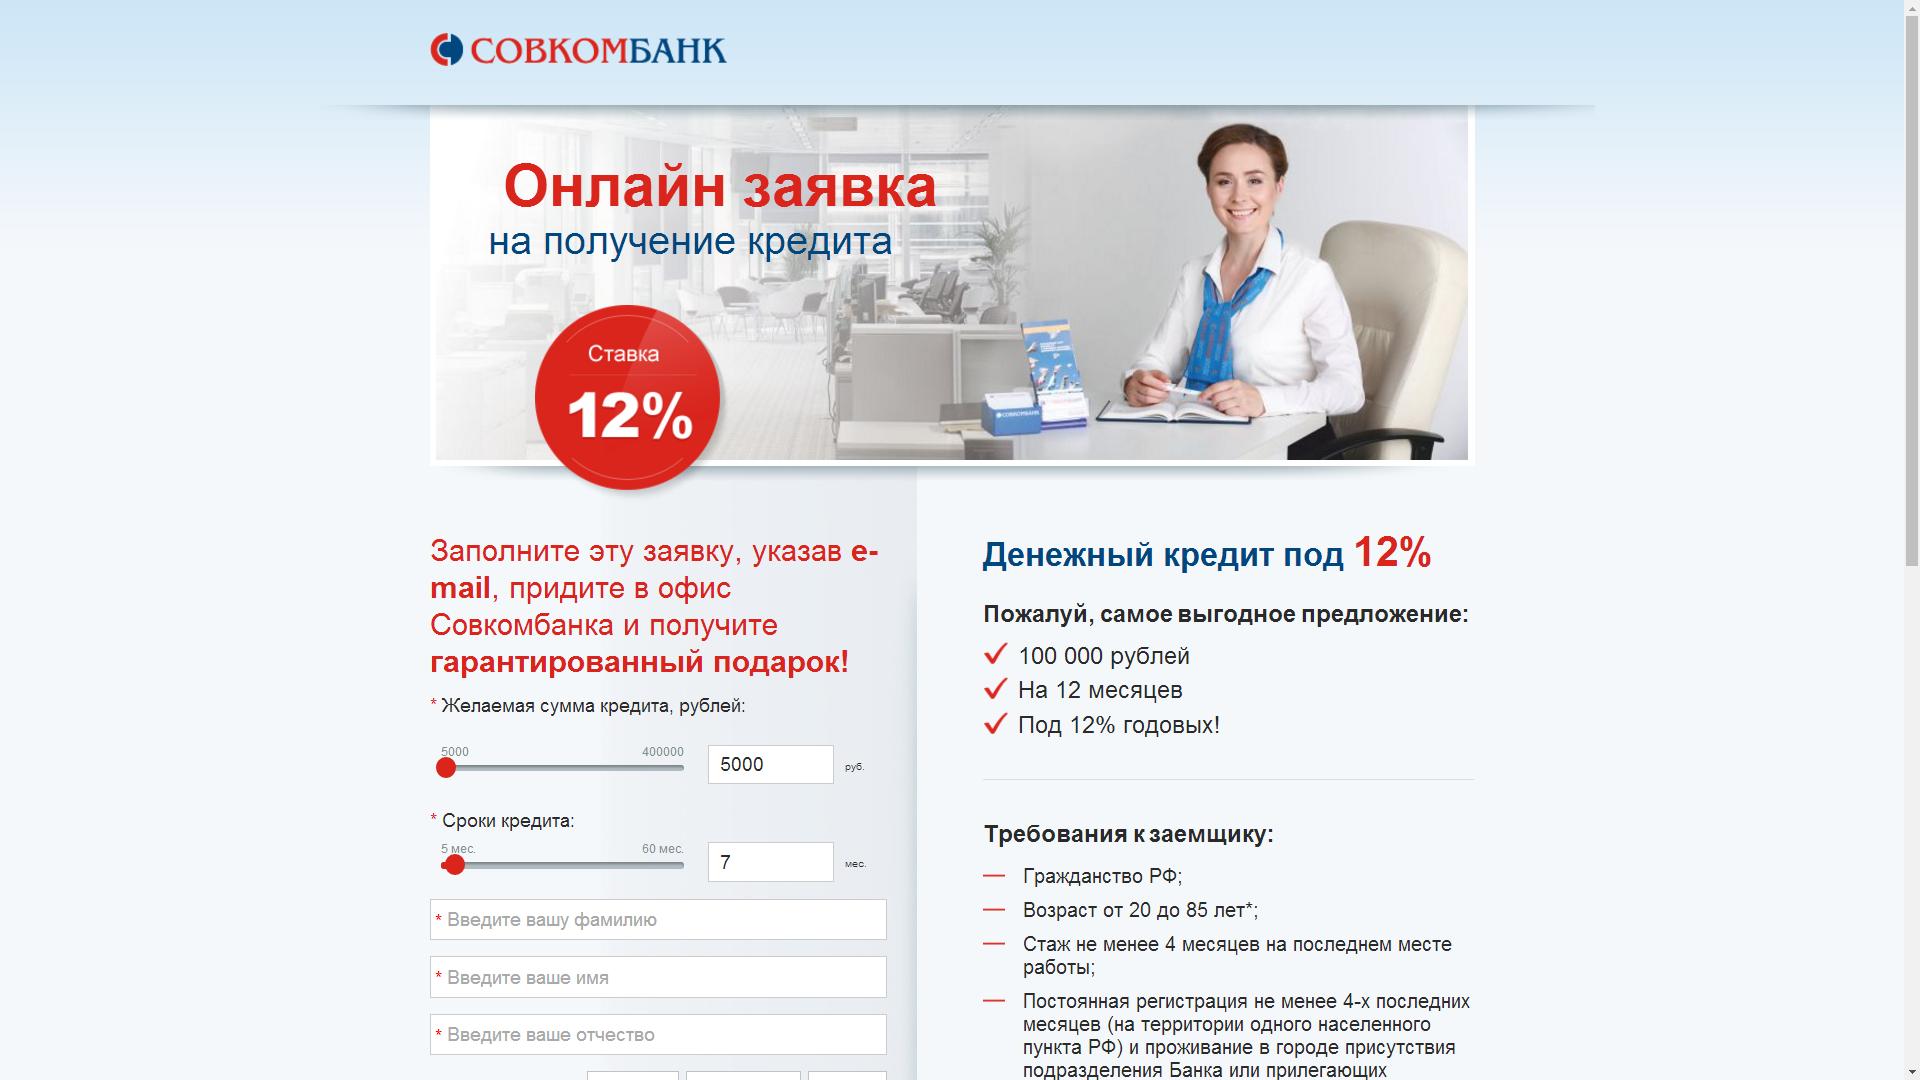 Онлайн заявка в совкомбанк кредит банки ульяновска кредит под залог недвижимости